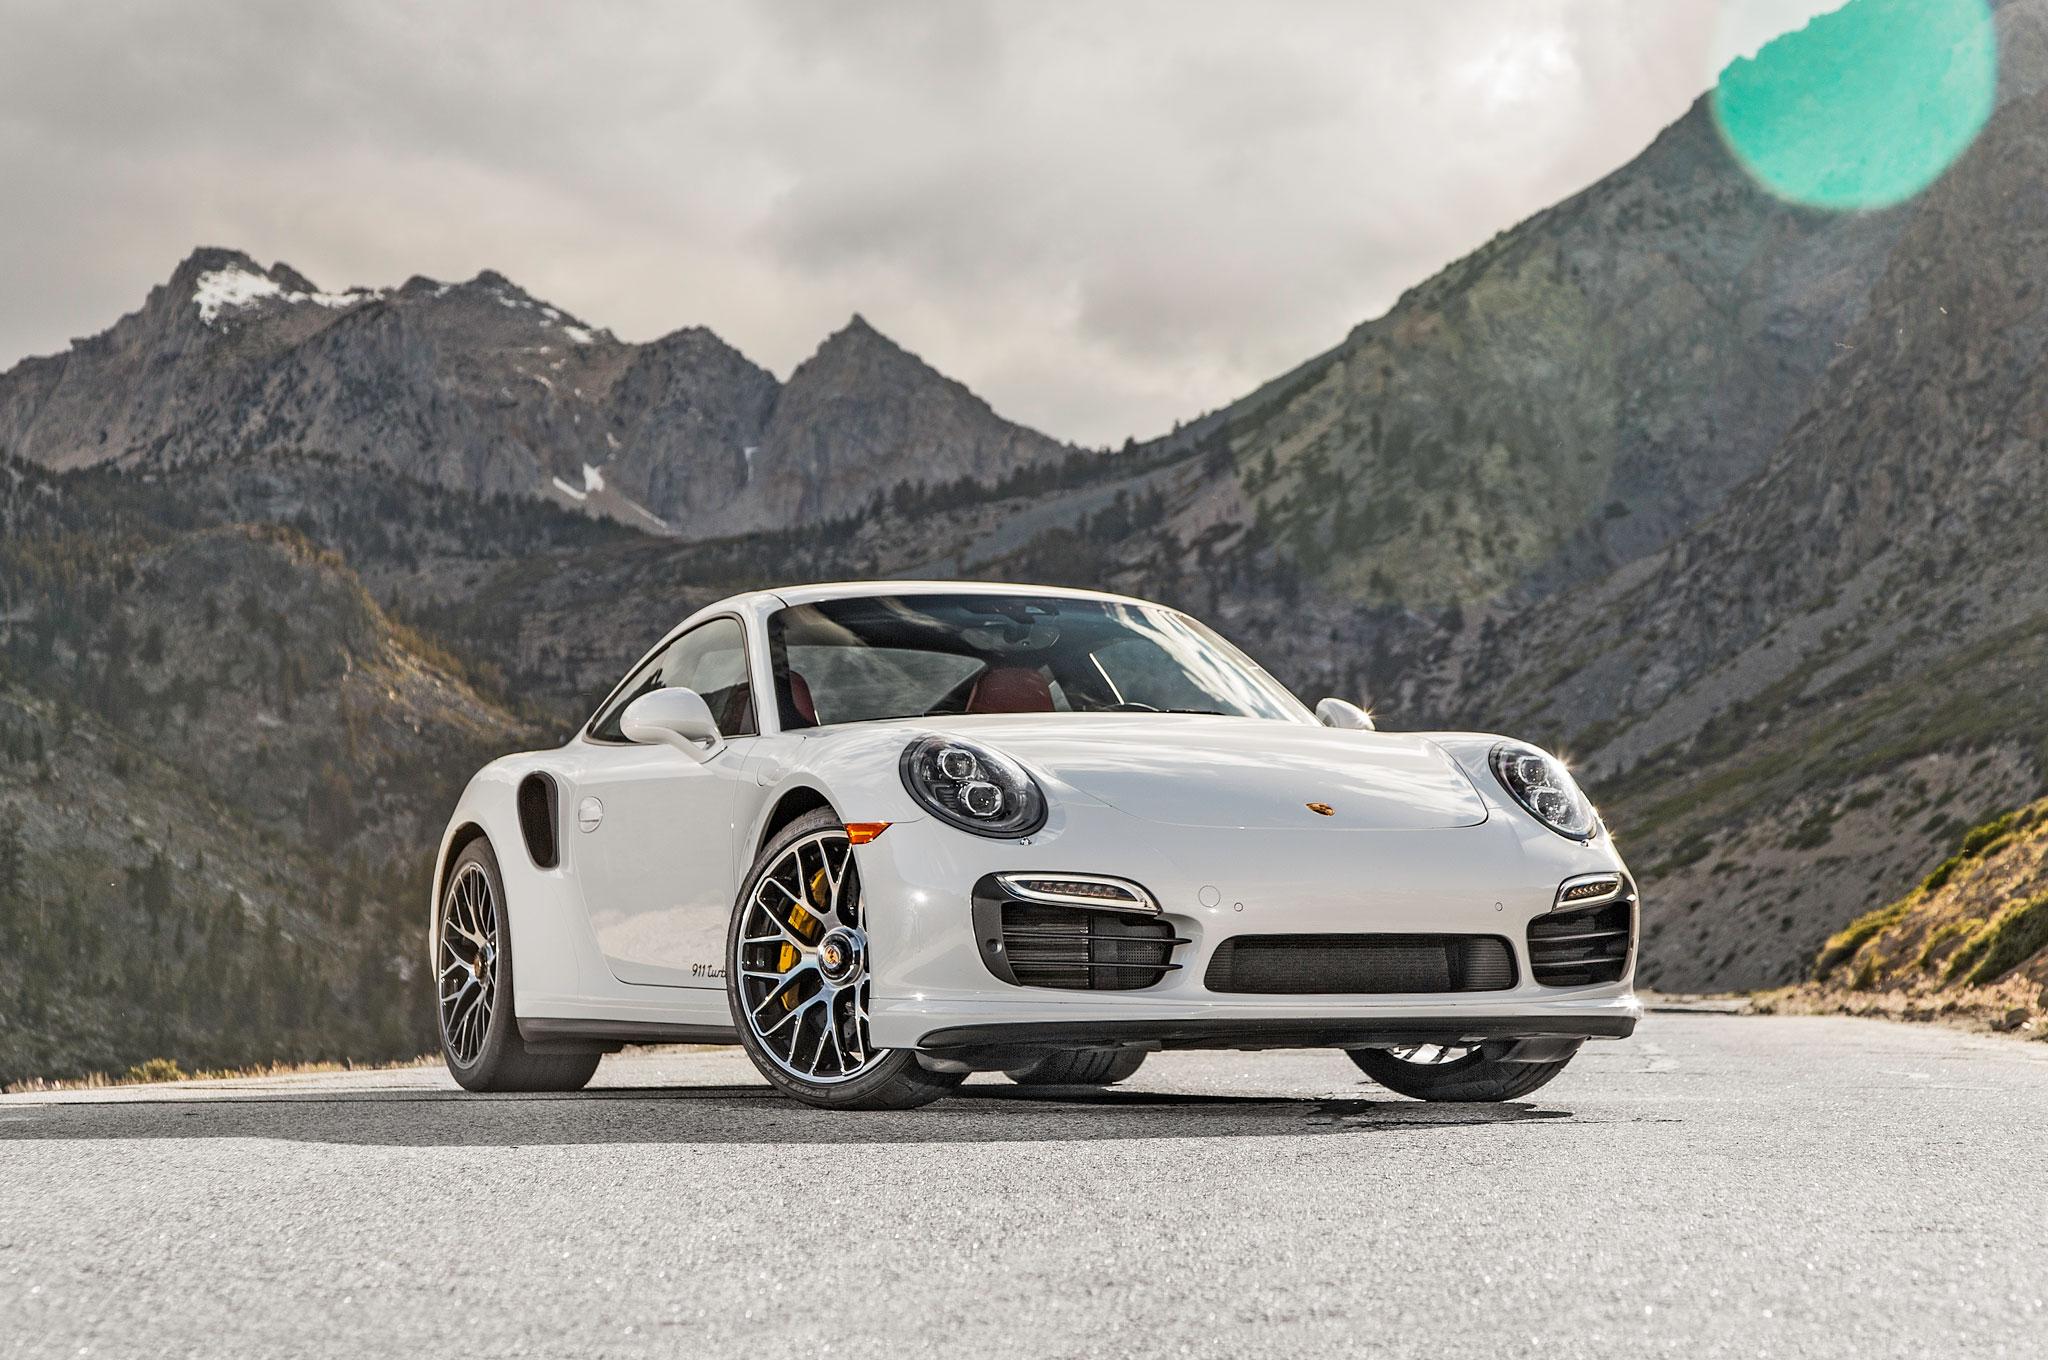 2015 porsche 911 turbo s front three quarter